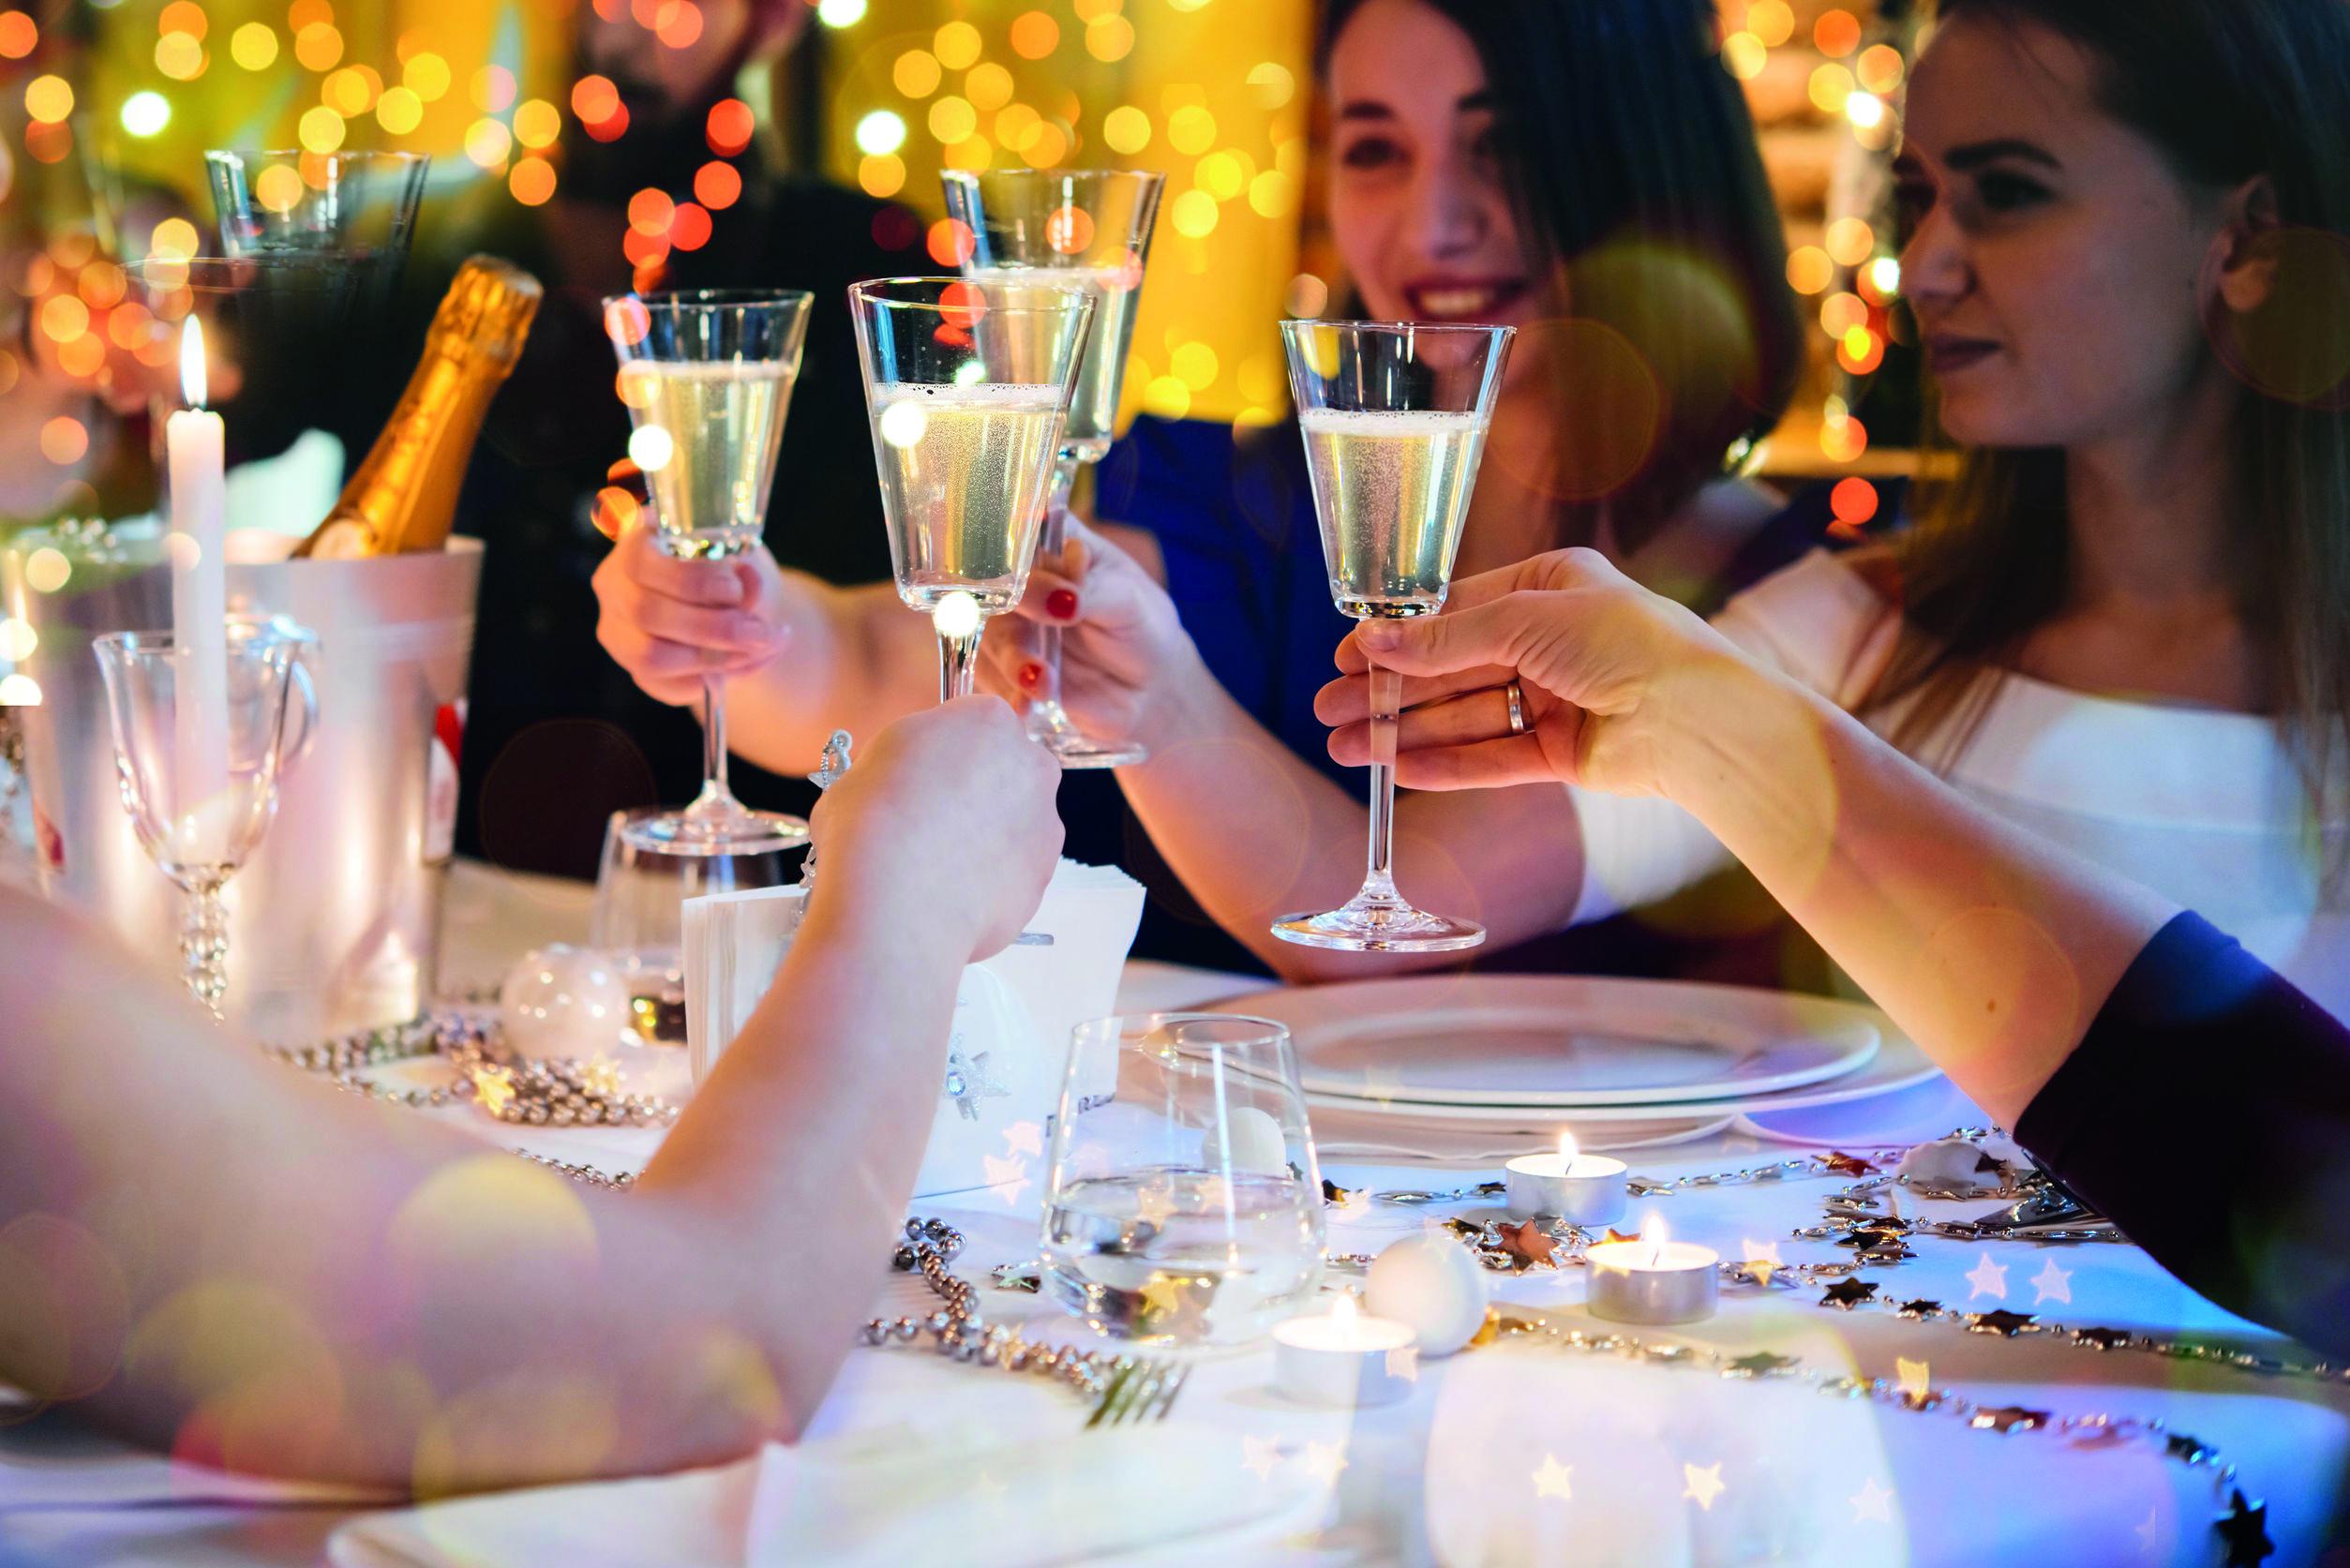 Festive Dinner Cheers